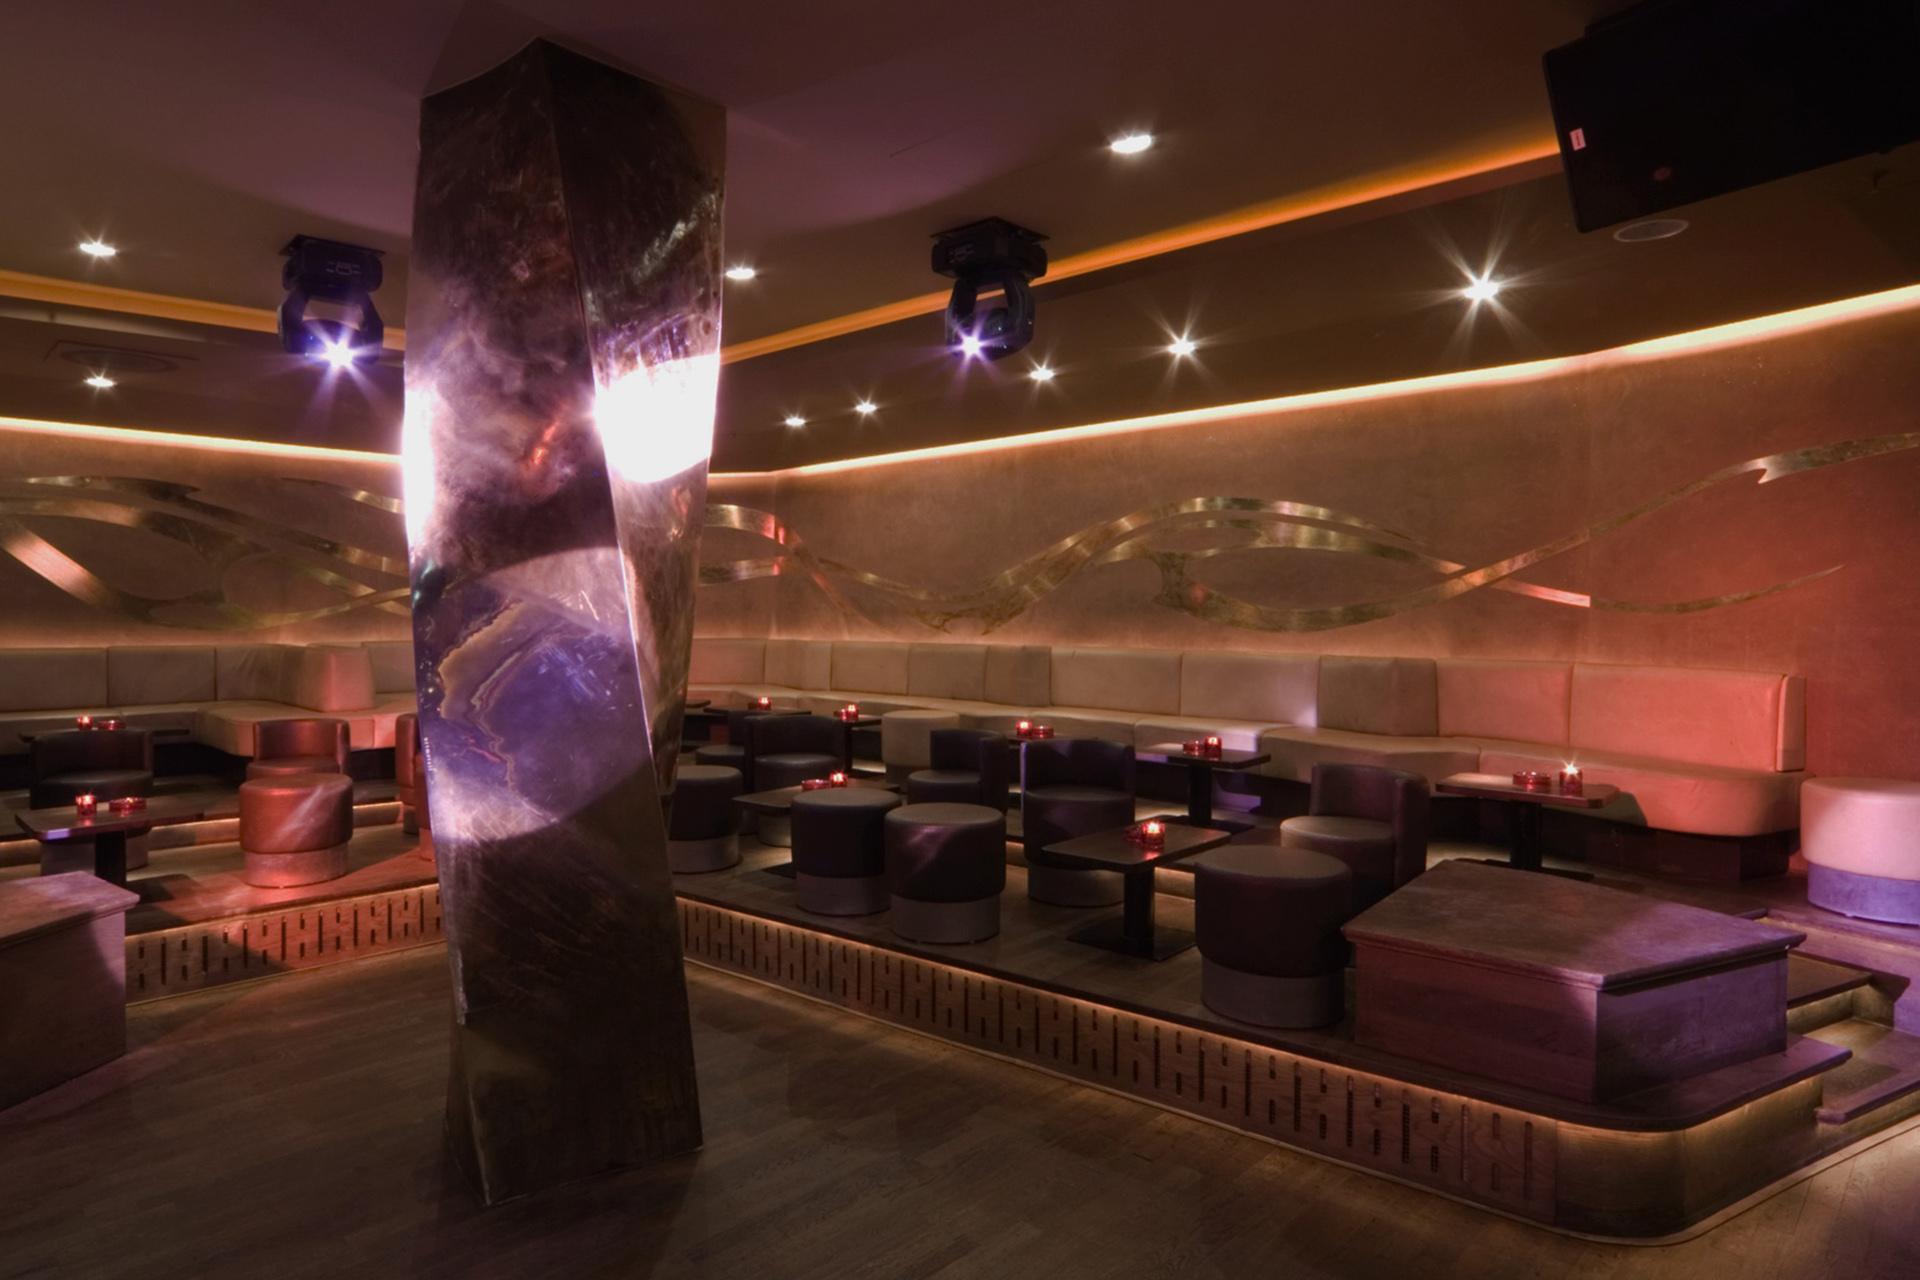 004-interior-design-hospitality-night-club-bar-pacha-muenchen-buero-philipp-moeller.jpg